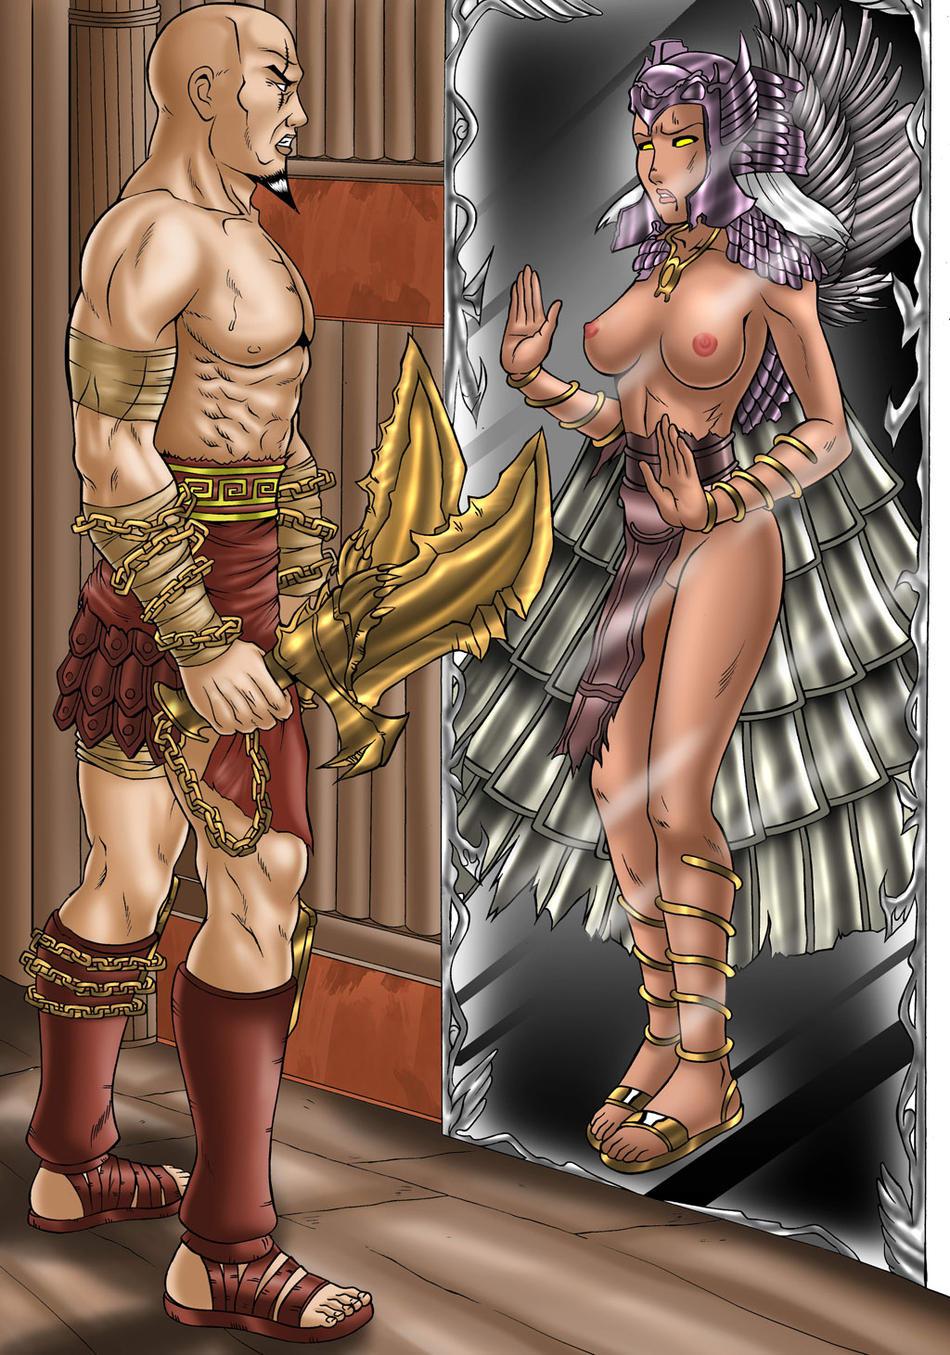 princess of poseidon war god Ghost in my attic 2 comic